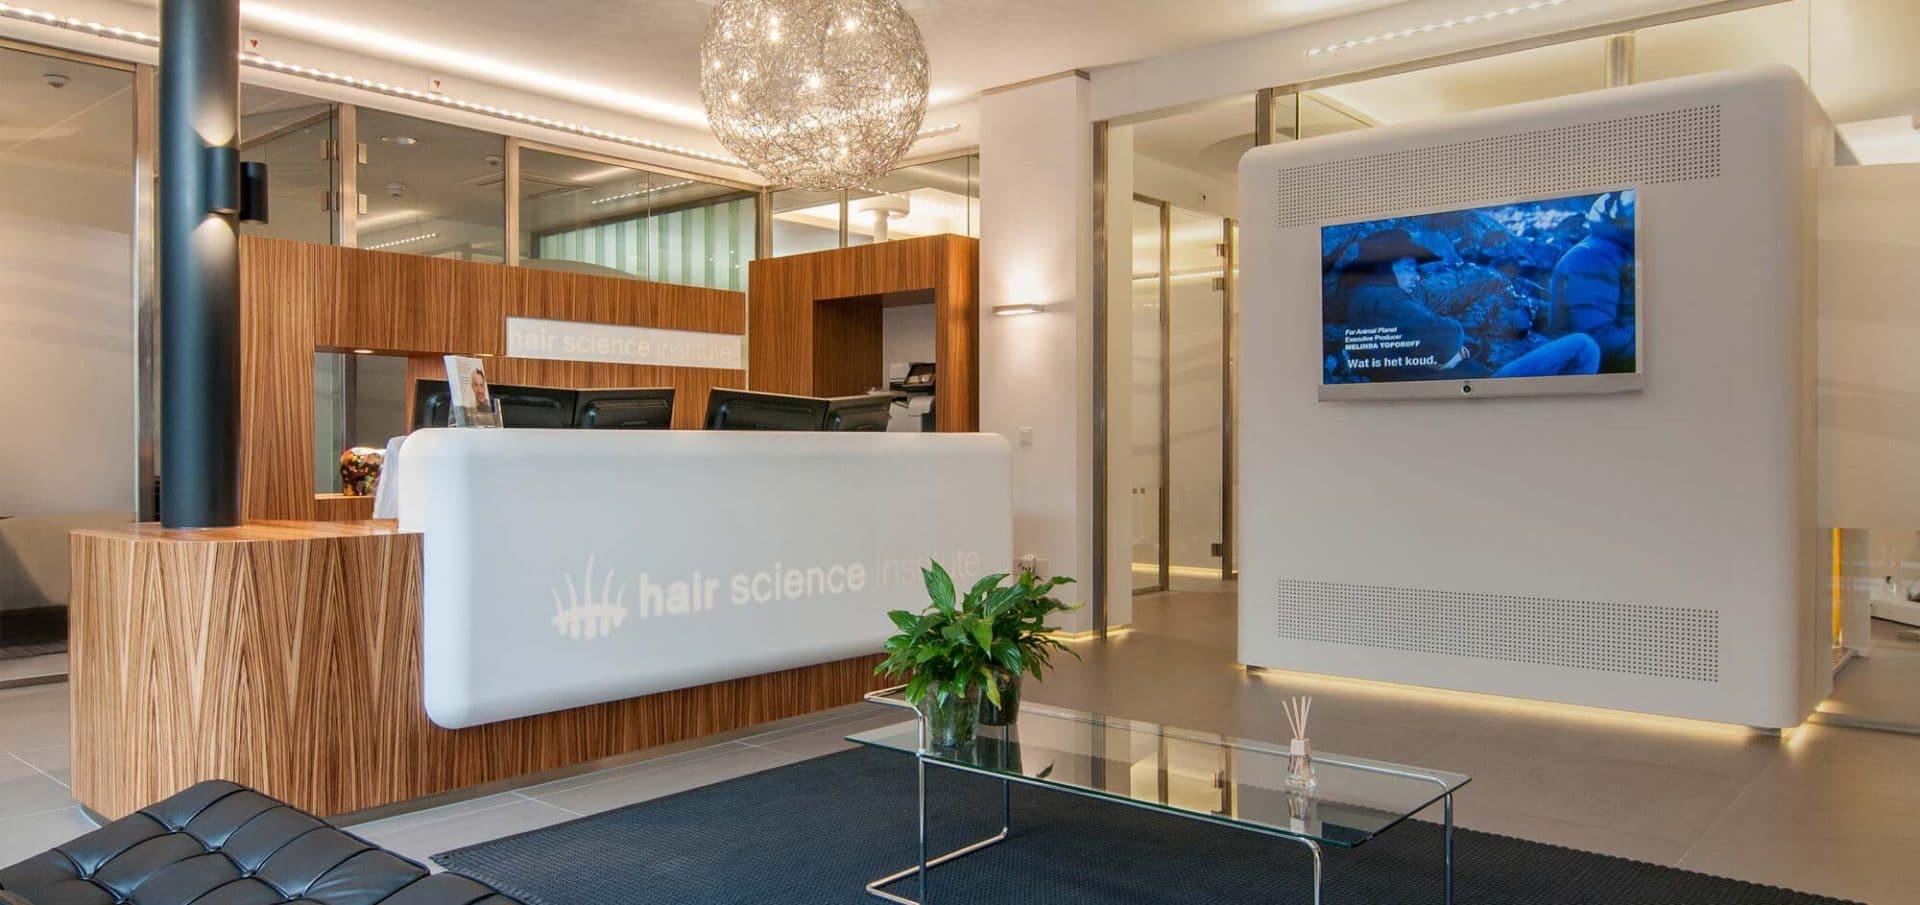 Desk HSI Maastricht with TV